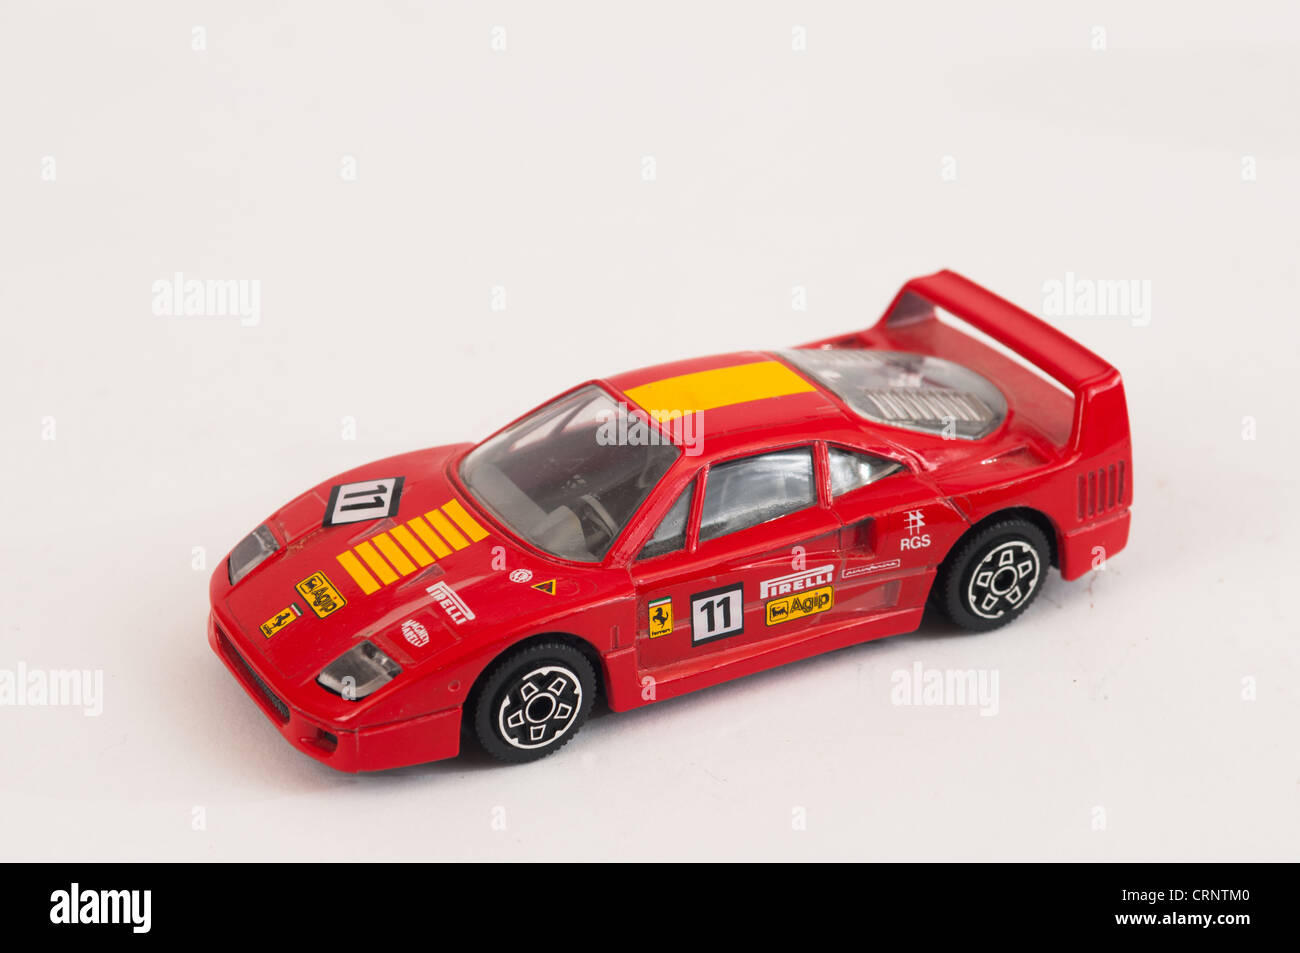 Ferrari F40 Burago Diecast Model Car Photo Stock